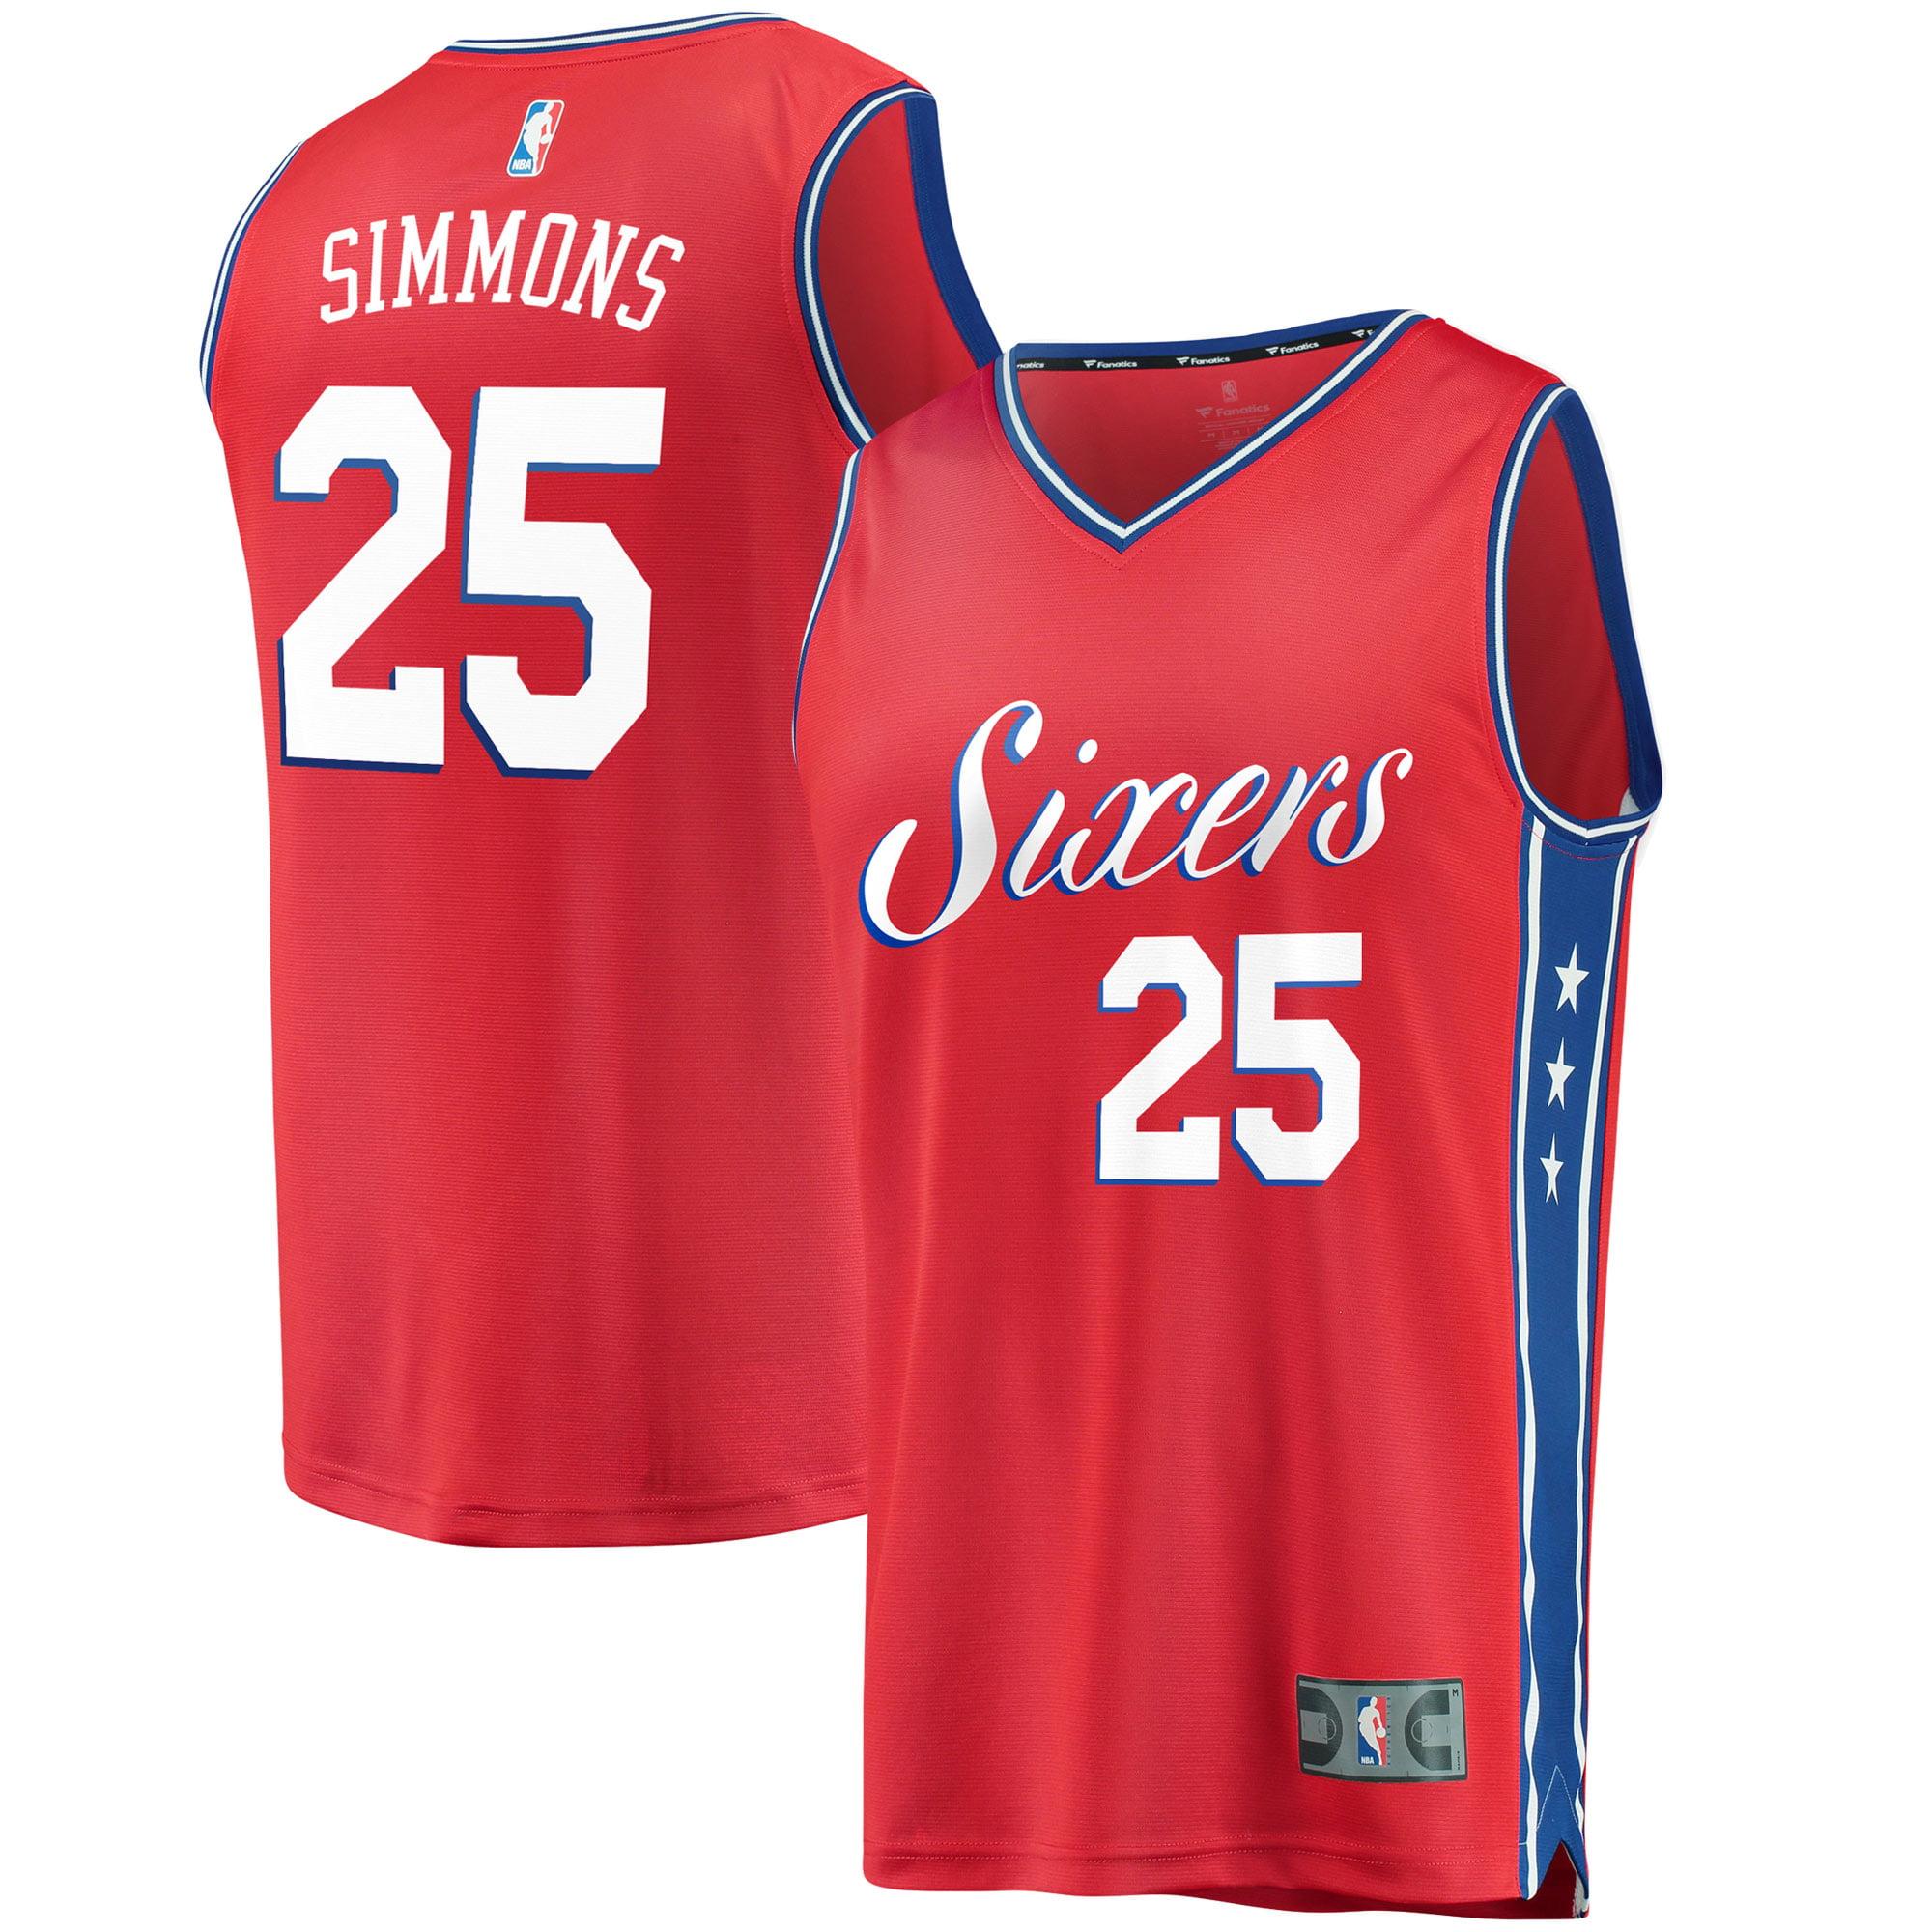 Ben Simmons Philadelphia 76ers Fanatics Branded Fast Break Replica Jersey Red - Statement Edition